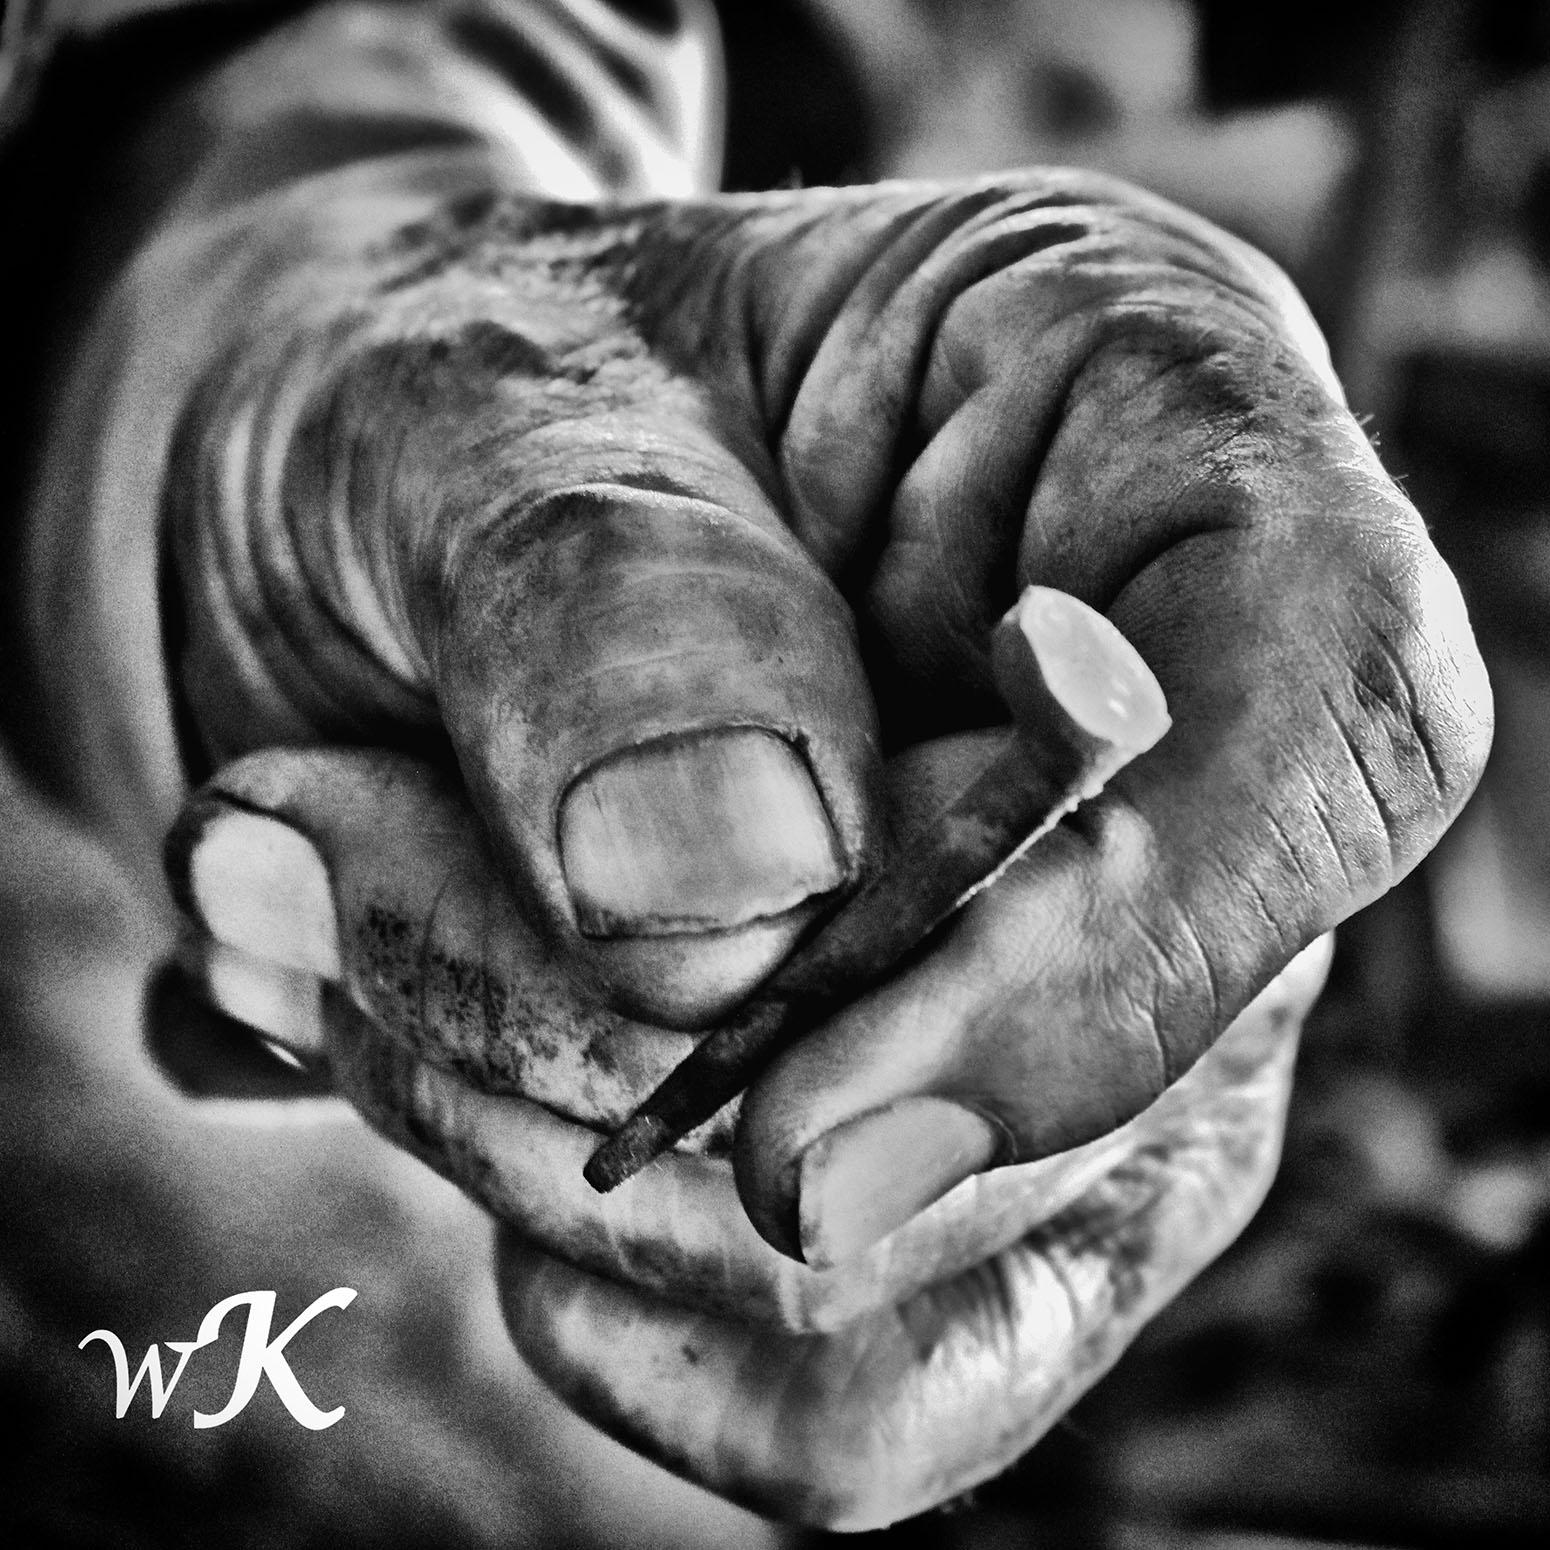 Smithy's hand